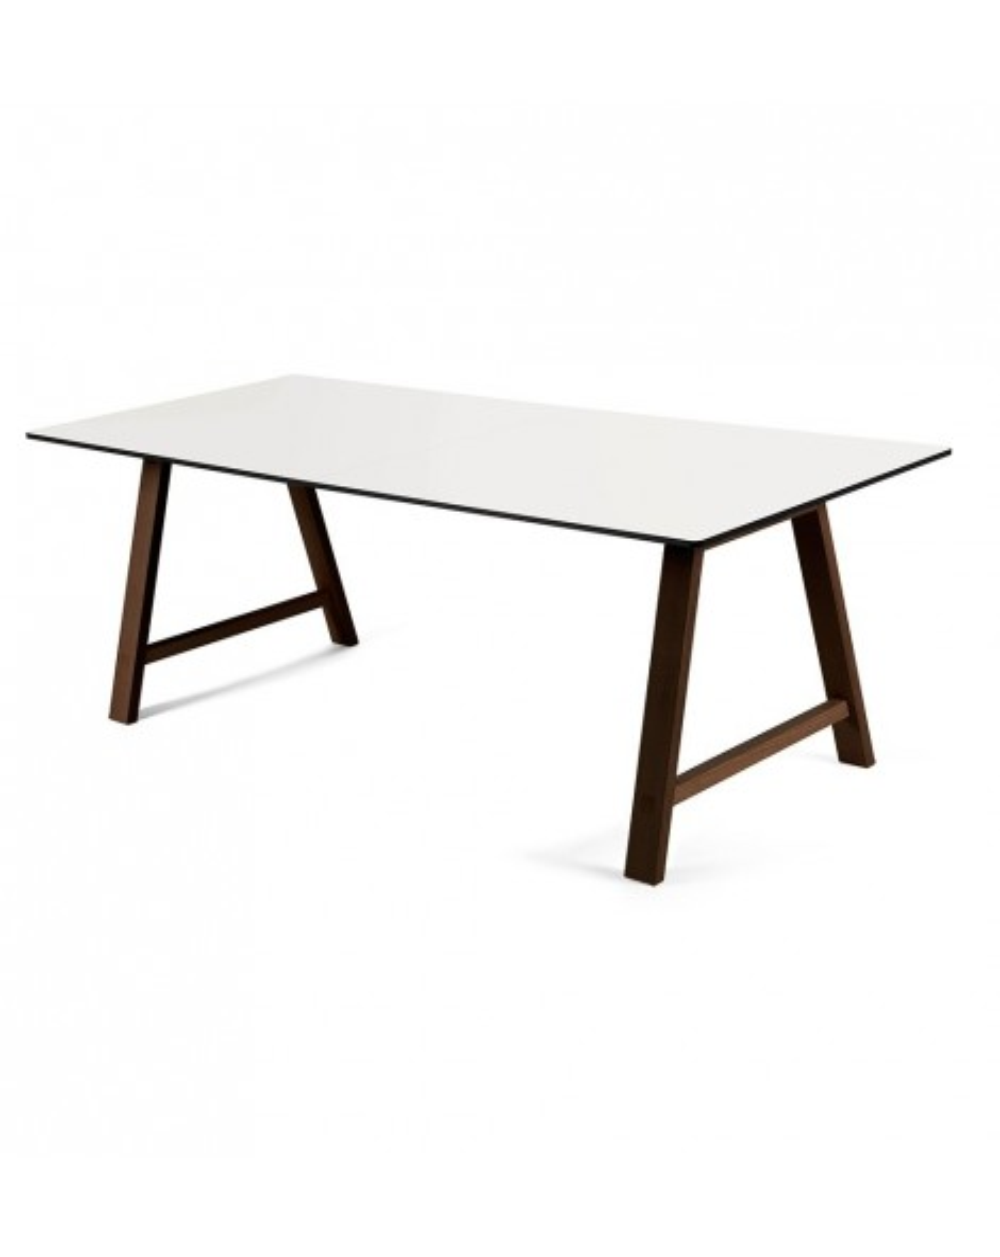 TABLE BYKATO T1